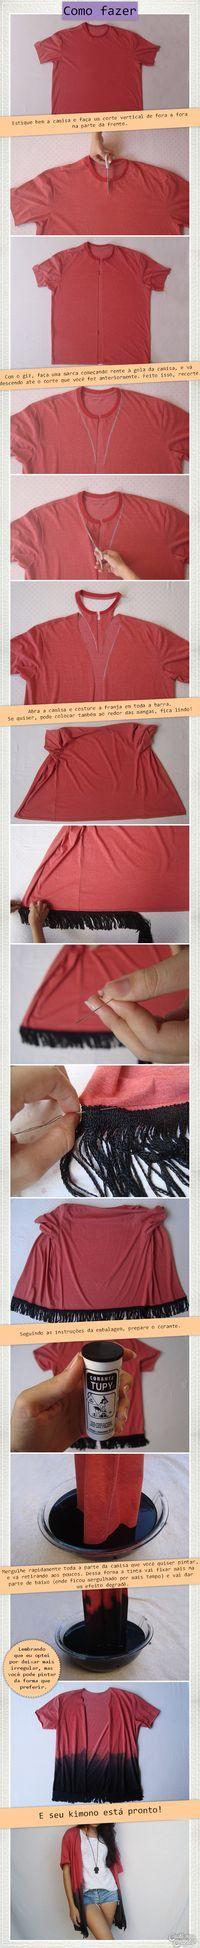 DIY Kimono   DIY Fashion   DIY Quimono   More details on http://www.cademeuchapeu.com/diy-kimono